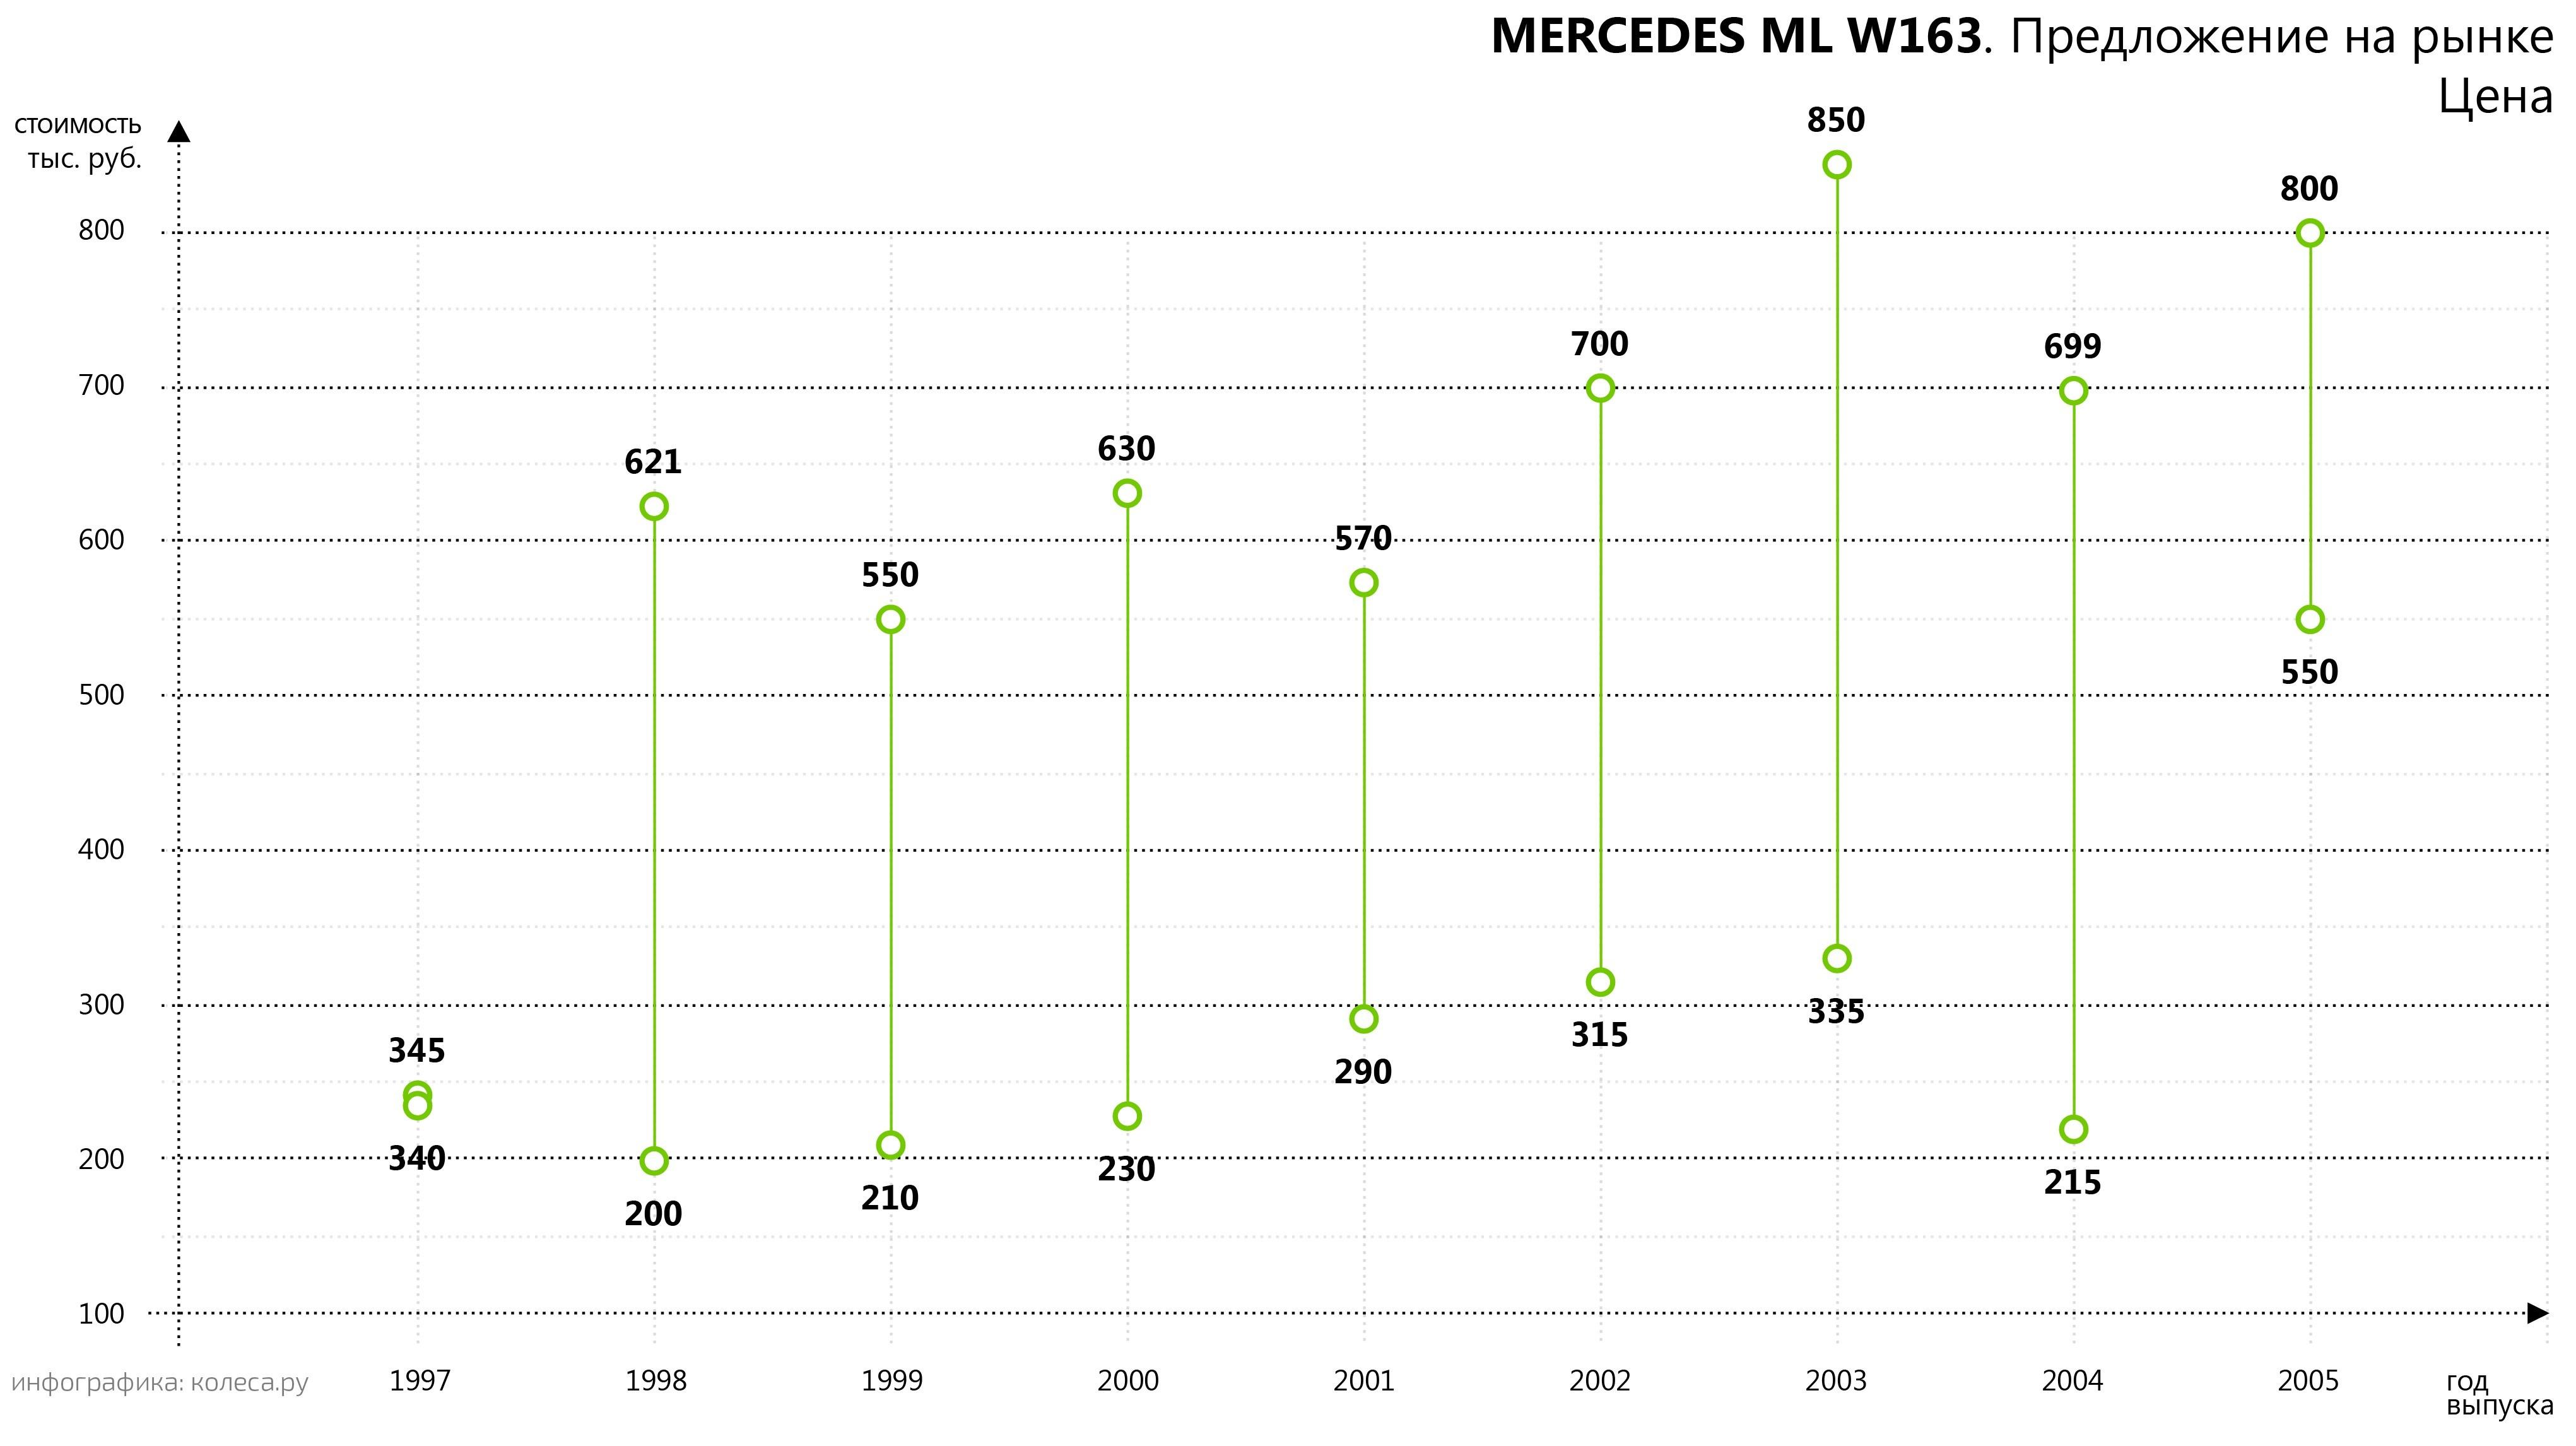 original-mercedes_ml_w163-01-01